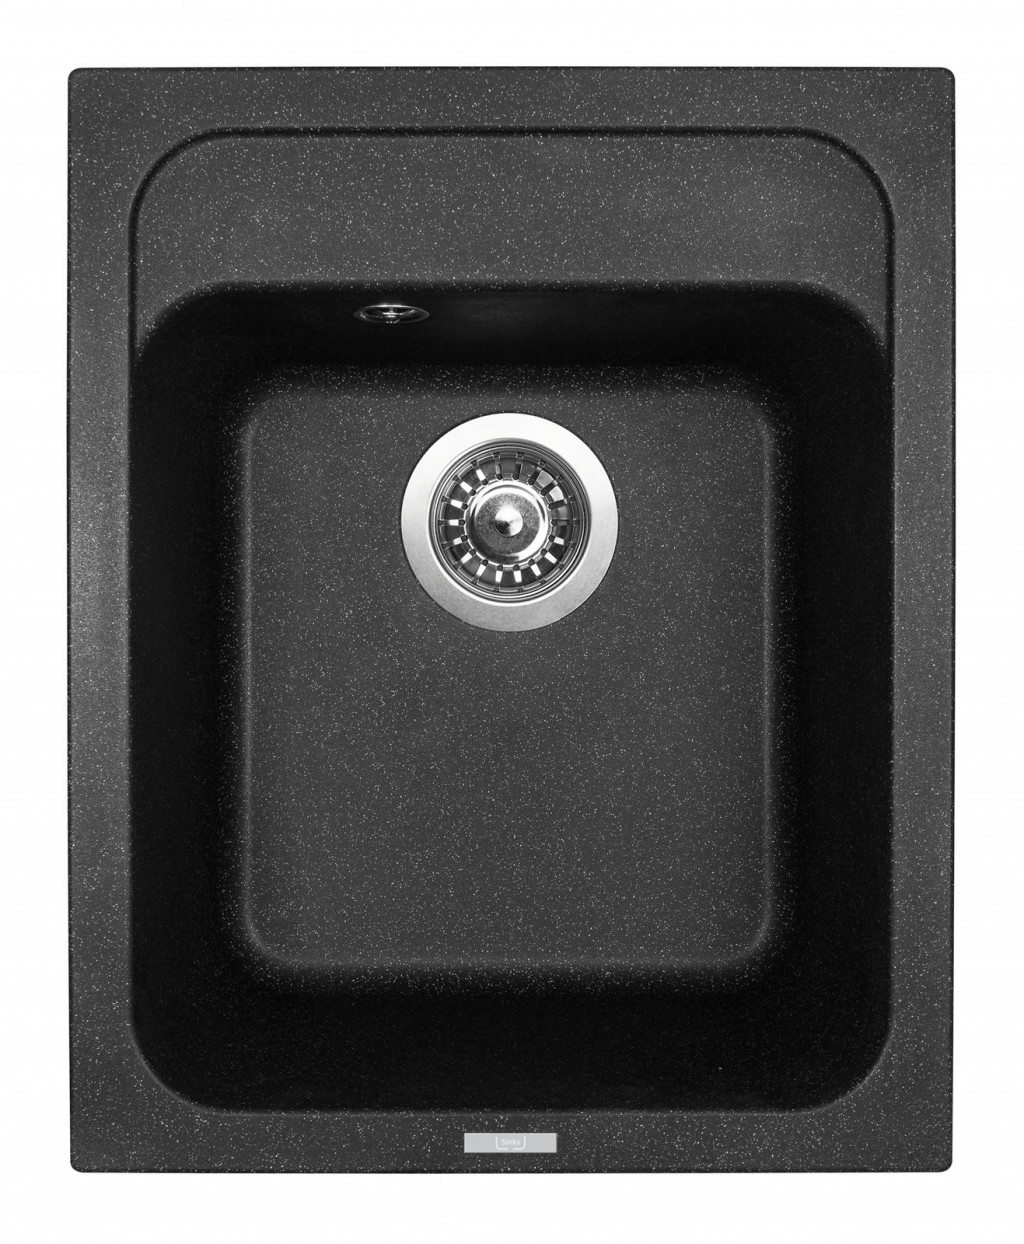 Sinks CLASSIC 400 Granblack + Sinks CAPRI 4 S - 30 Granblack